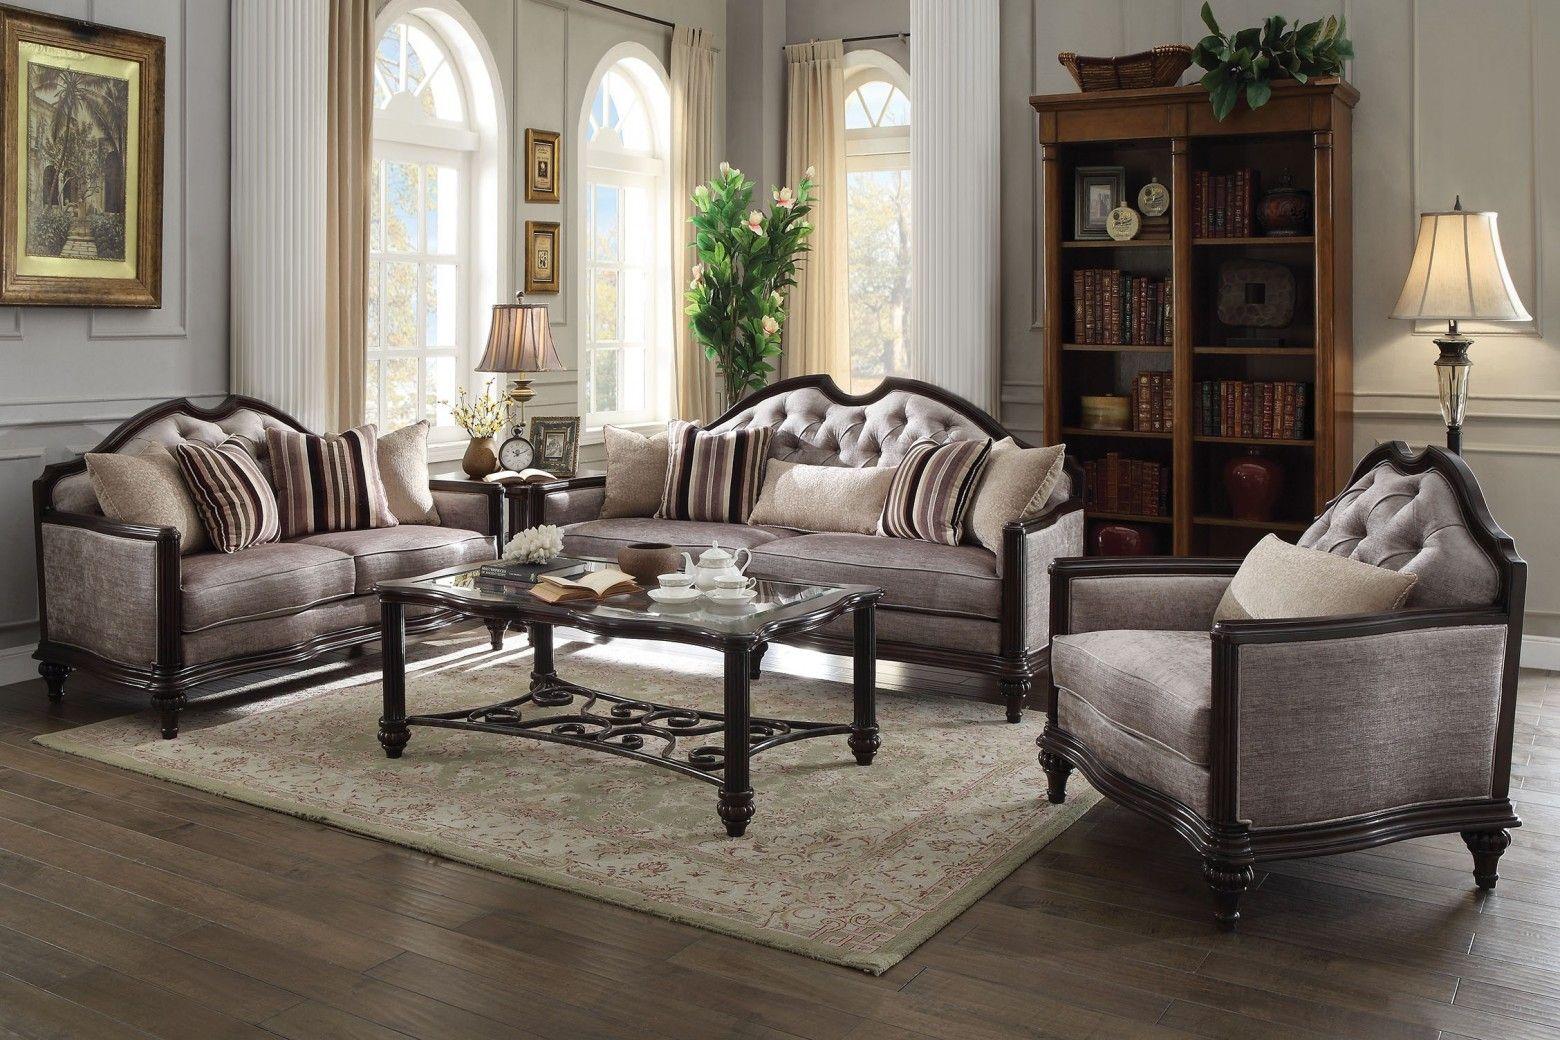 53770 Azis Living room set Dark Brown Finish / Gray Fabric